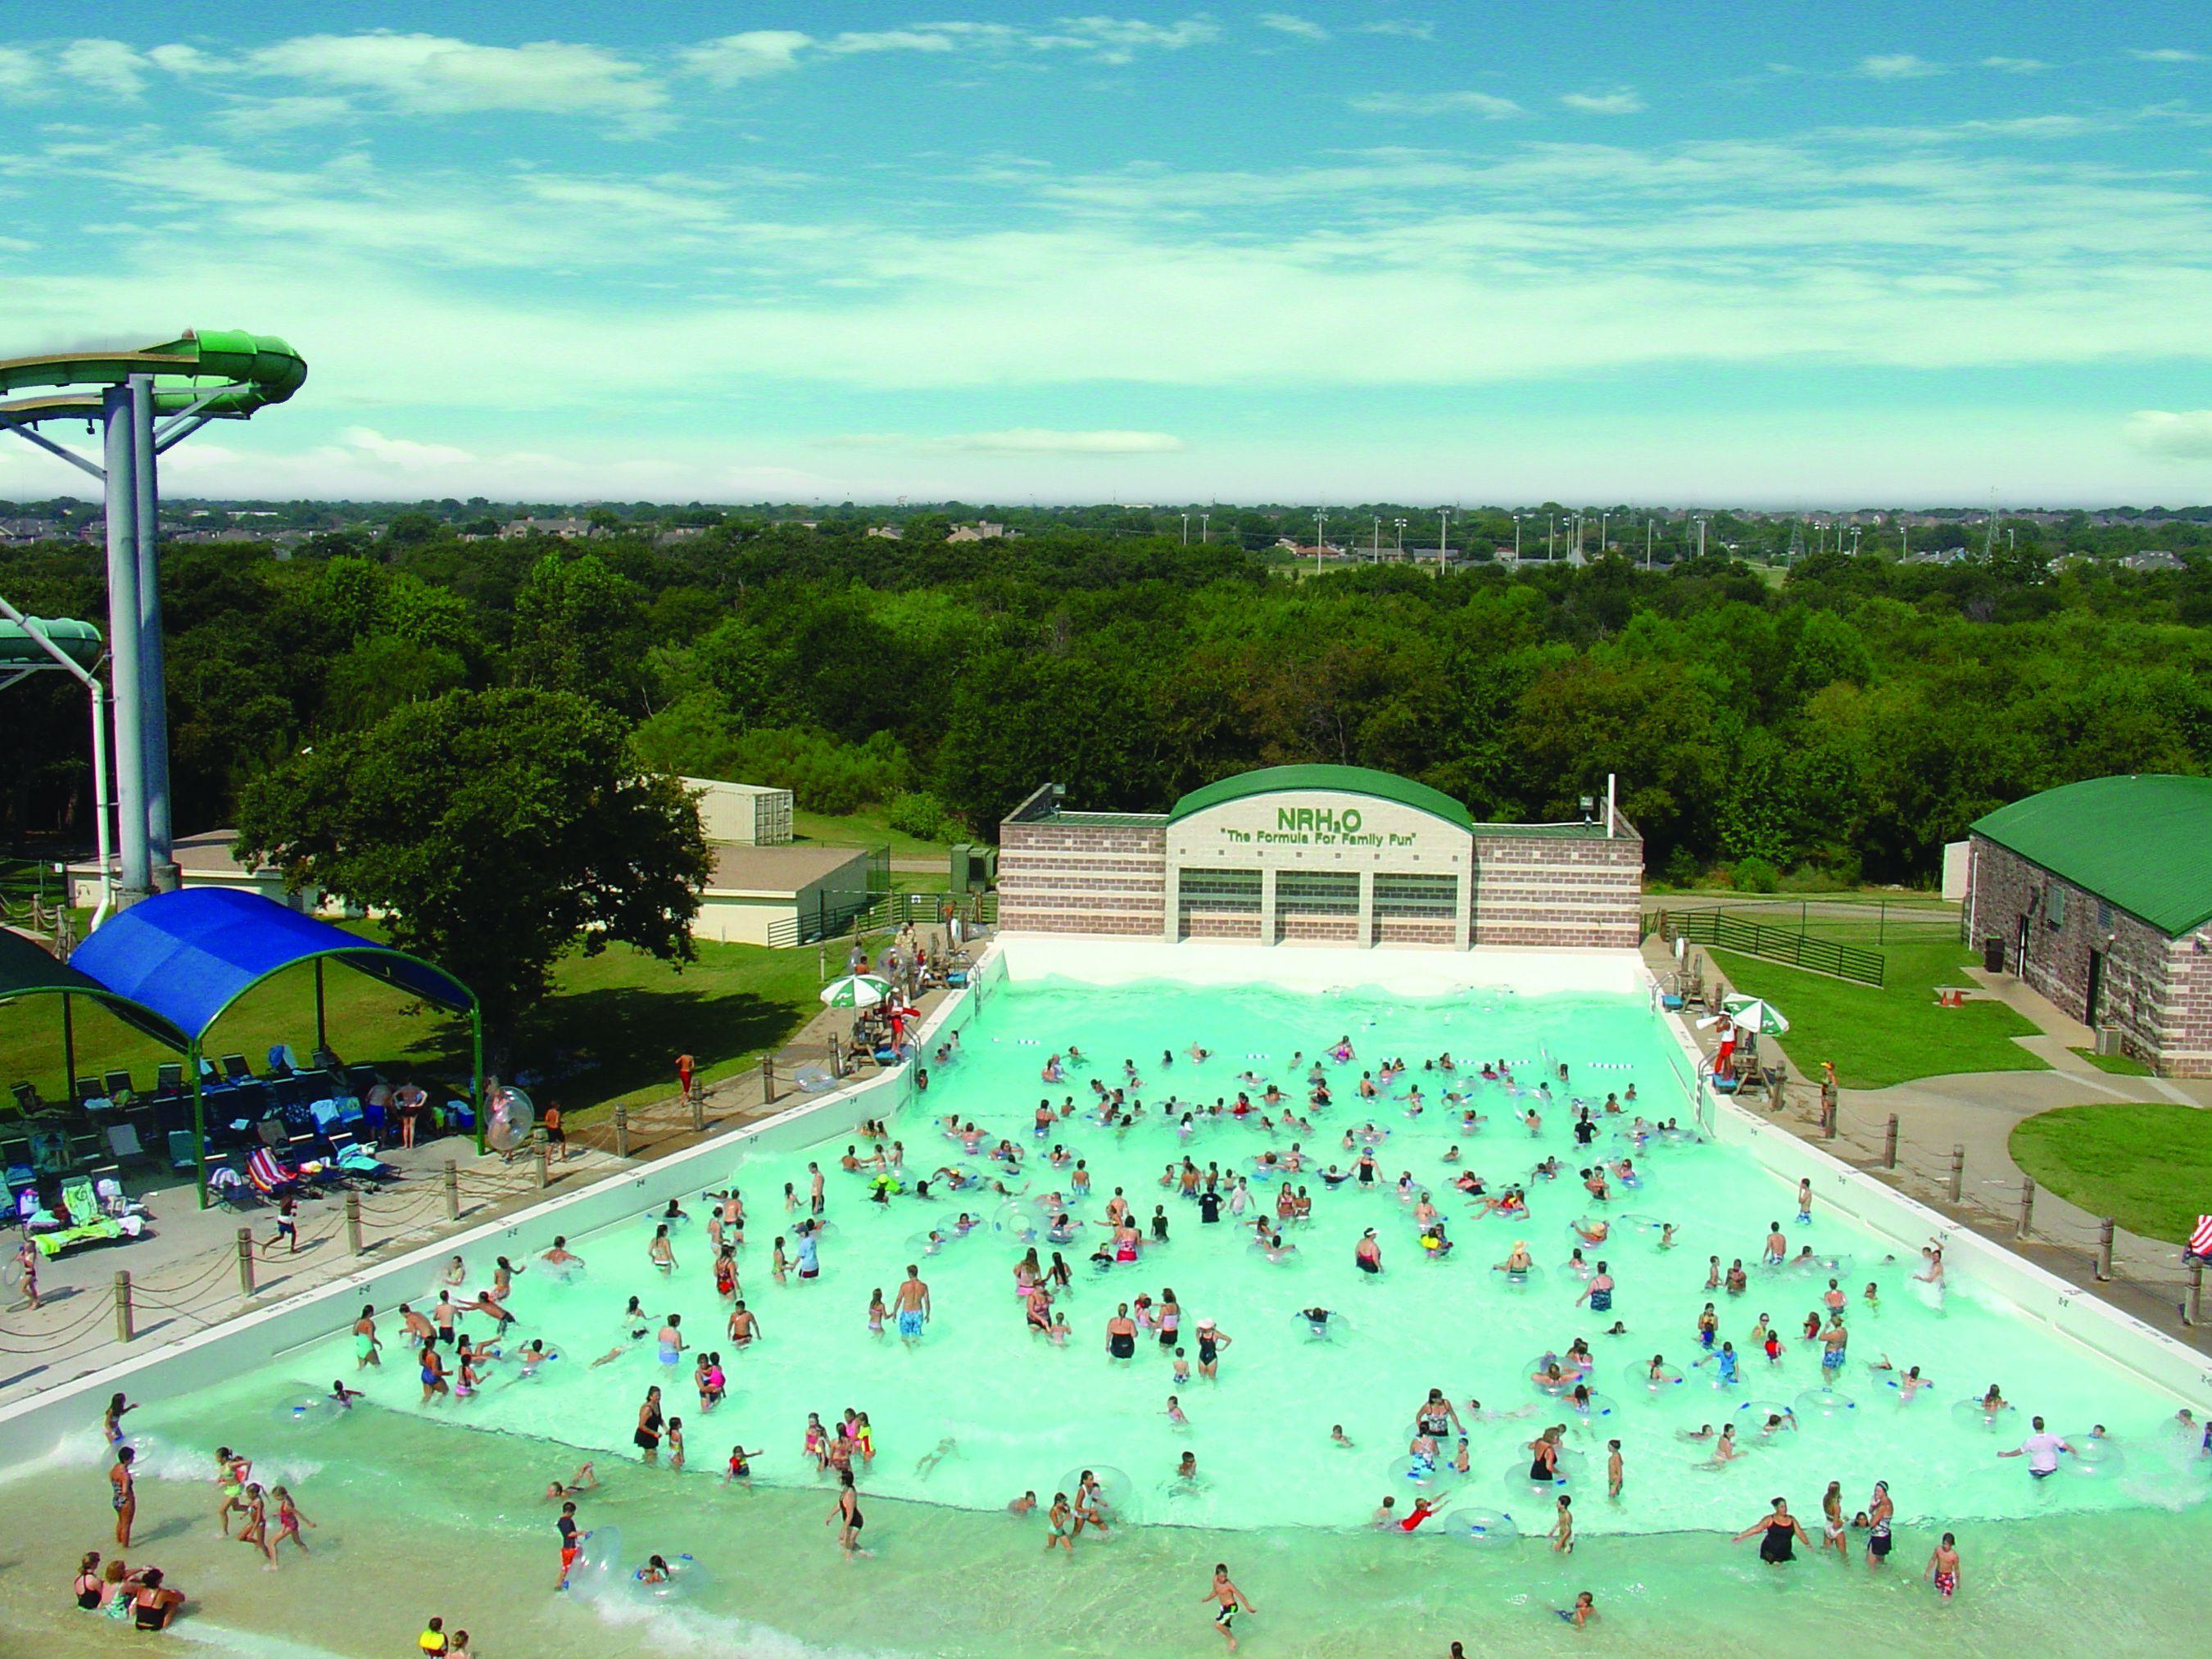 NRH2O Texas water park